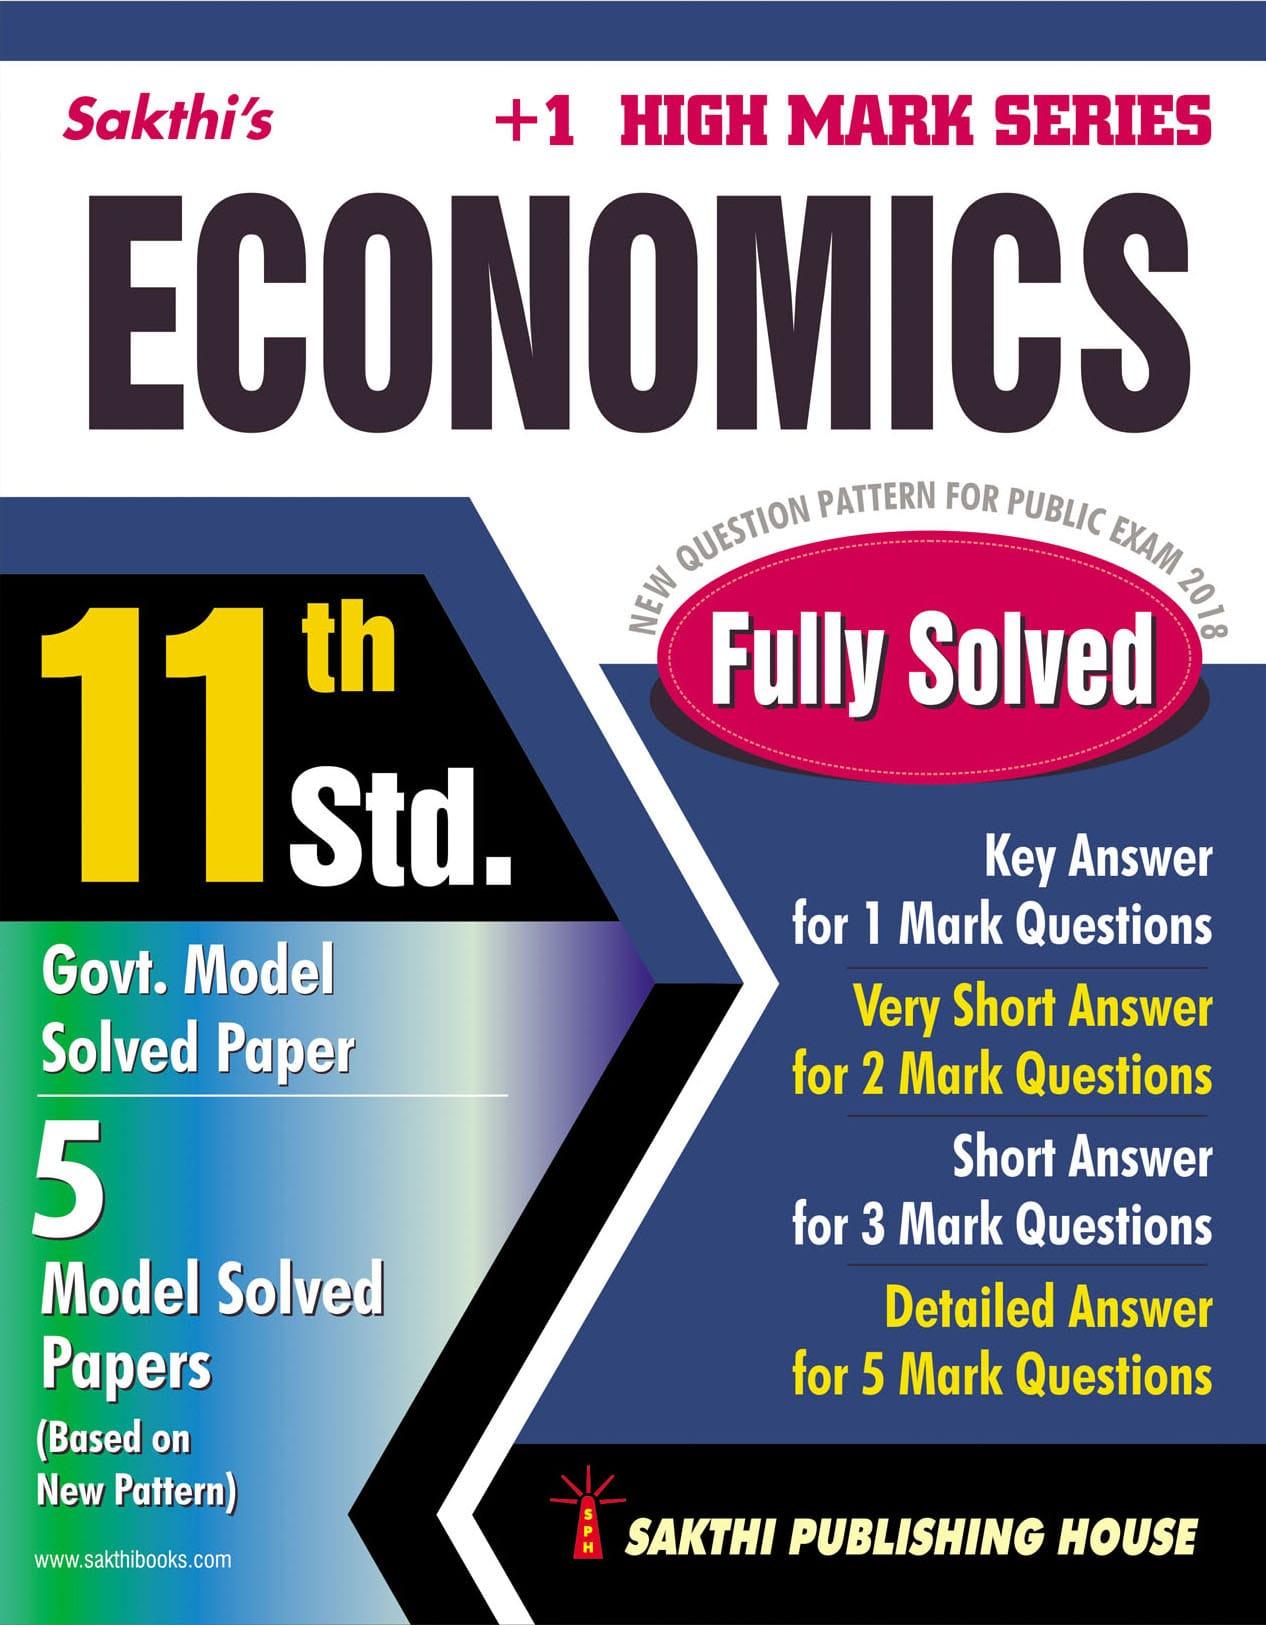 Buy State Board Exam Books : 11th Std Economics Exam Preparation